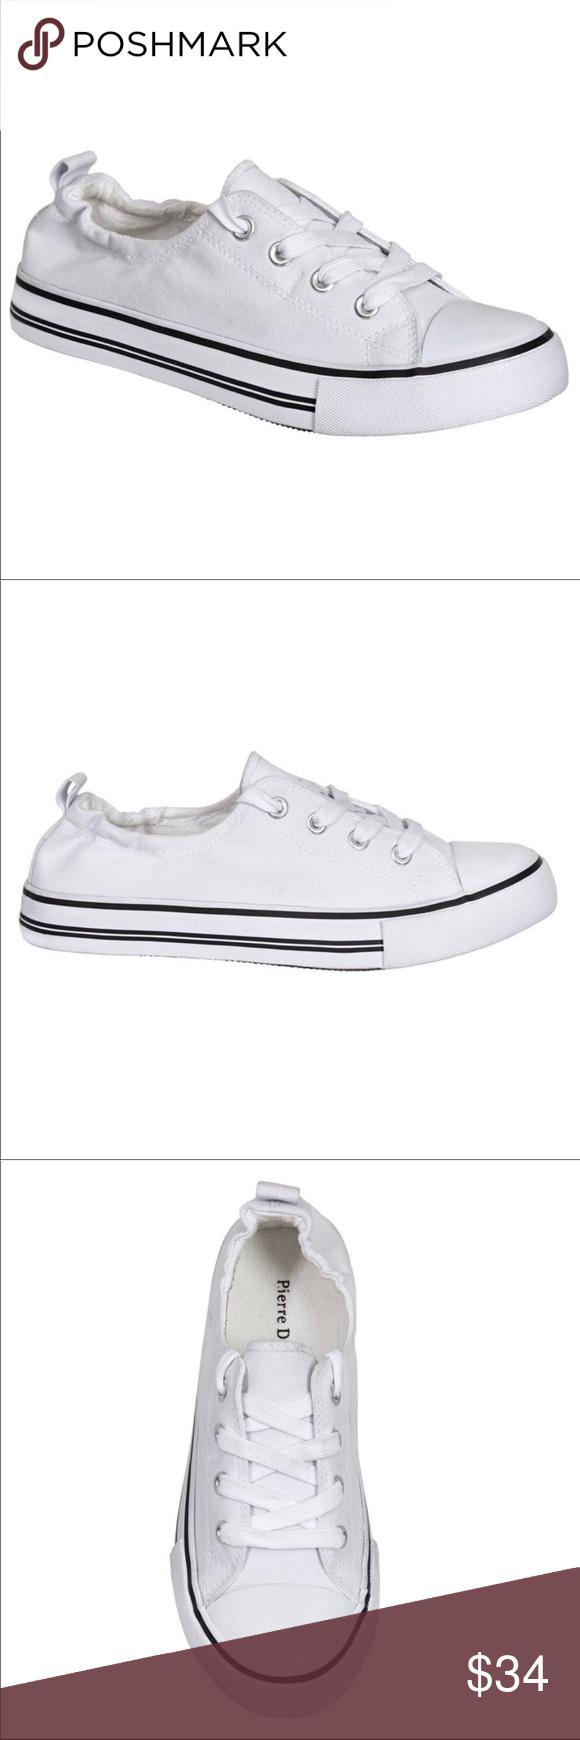 ⭐️ Pierre Dumas White Sneaker Boutique